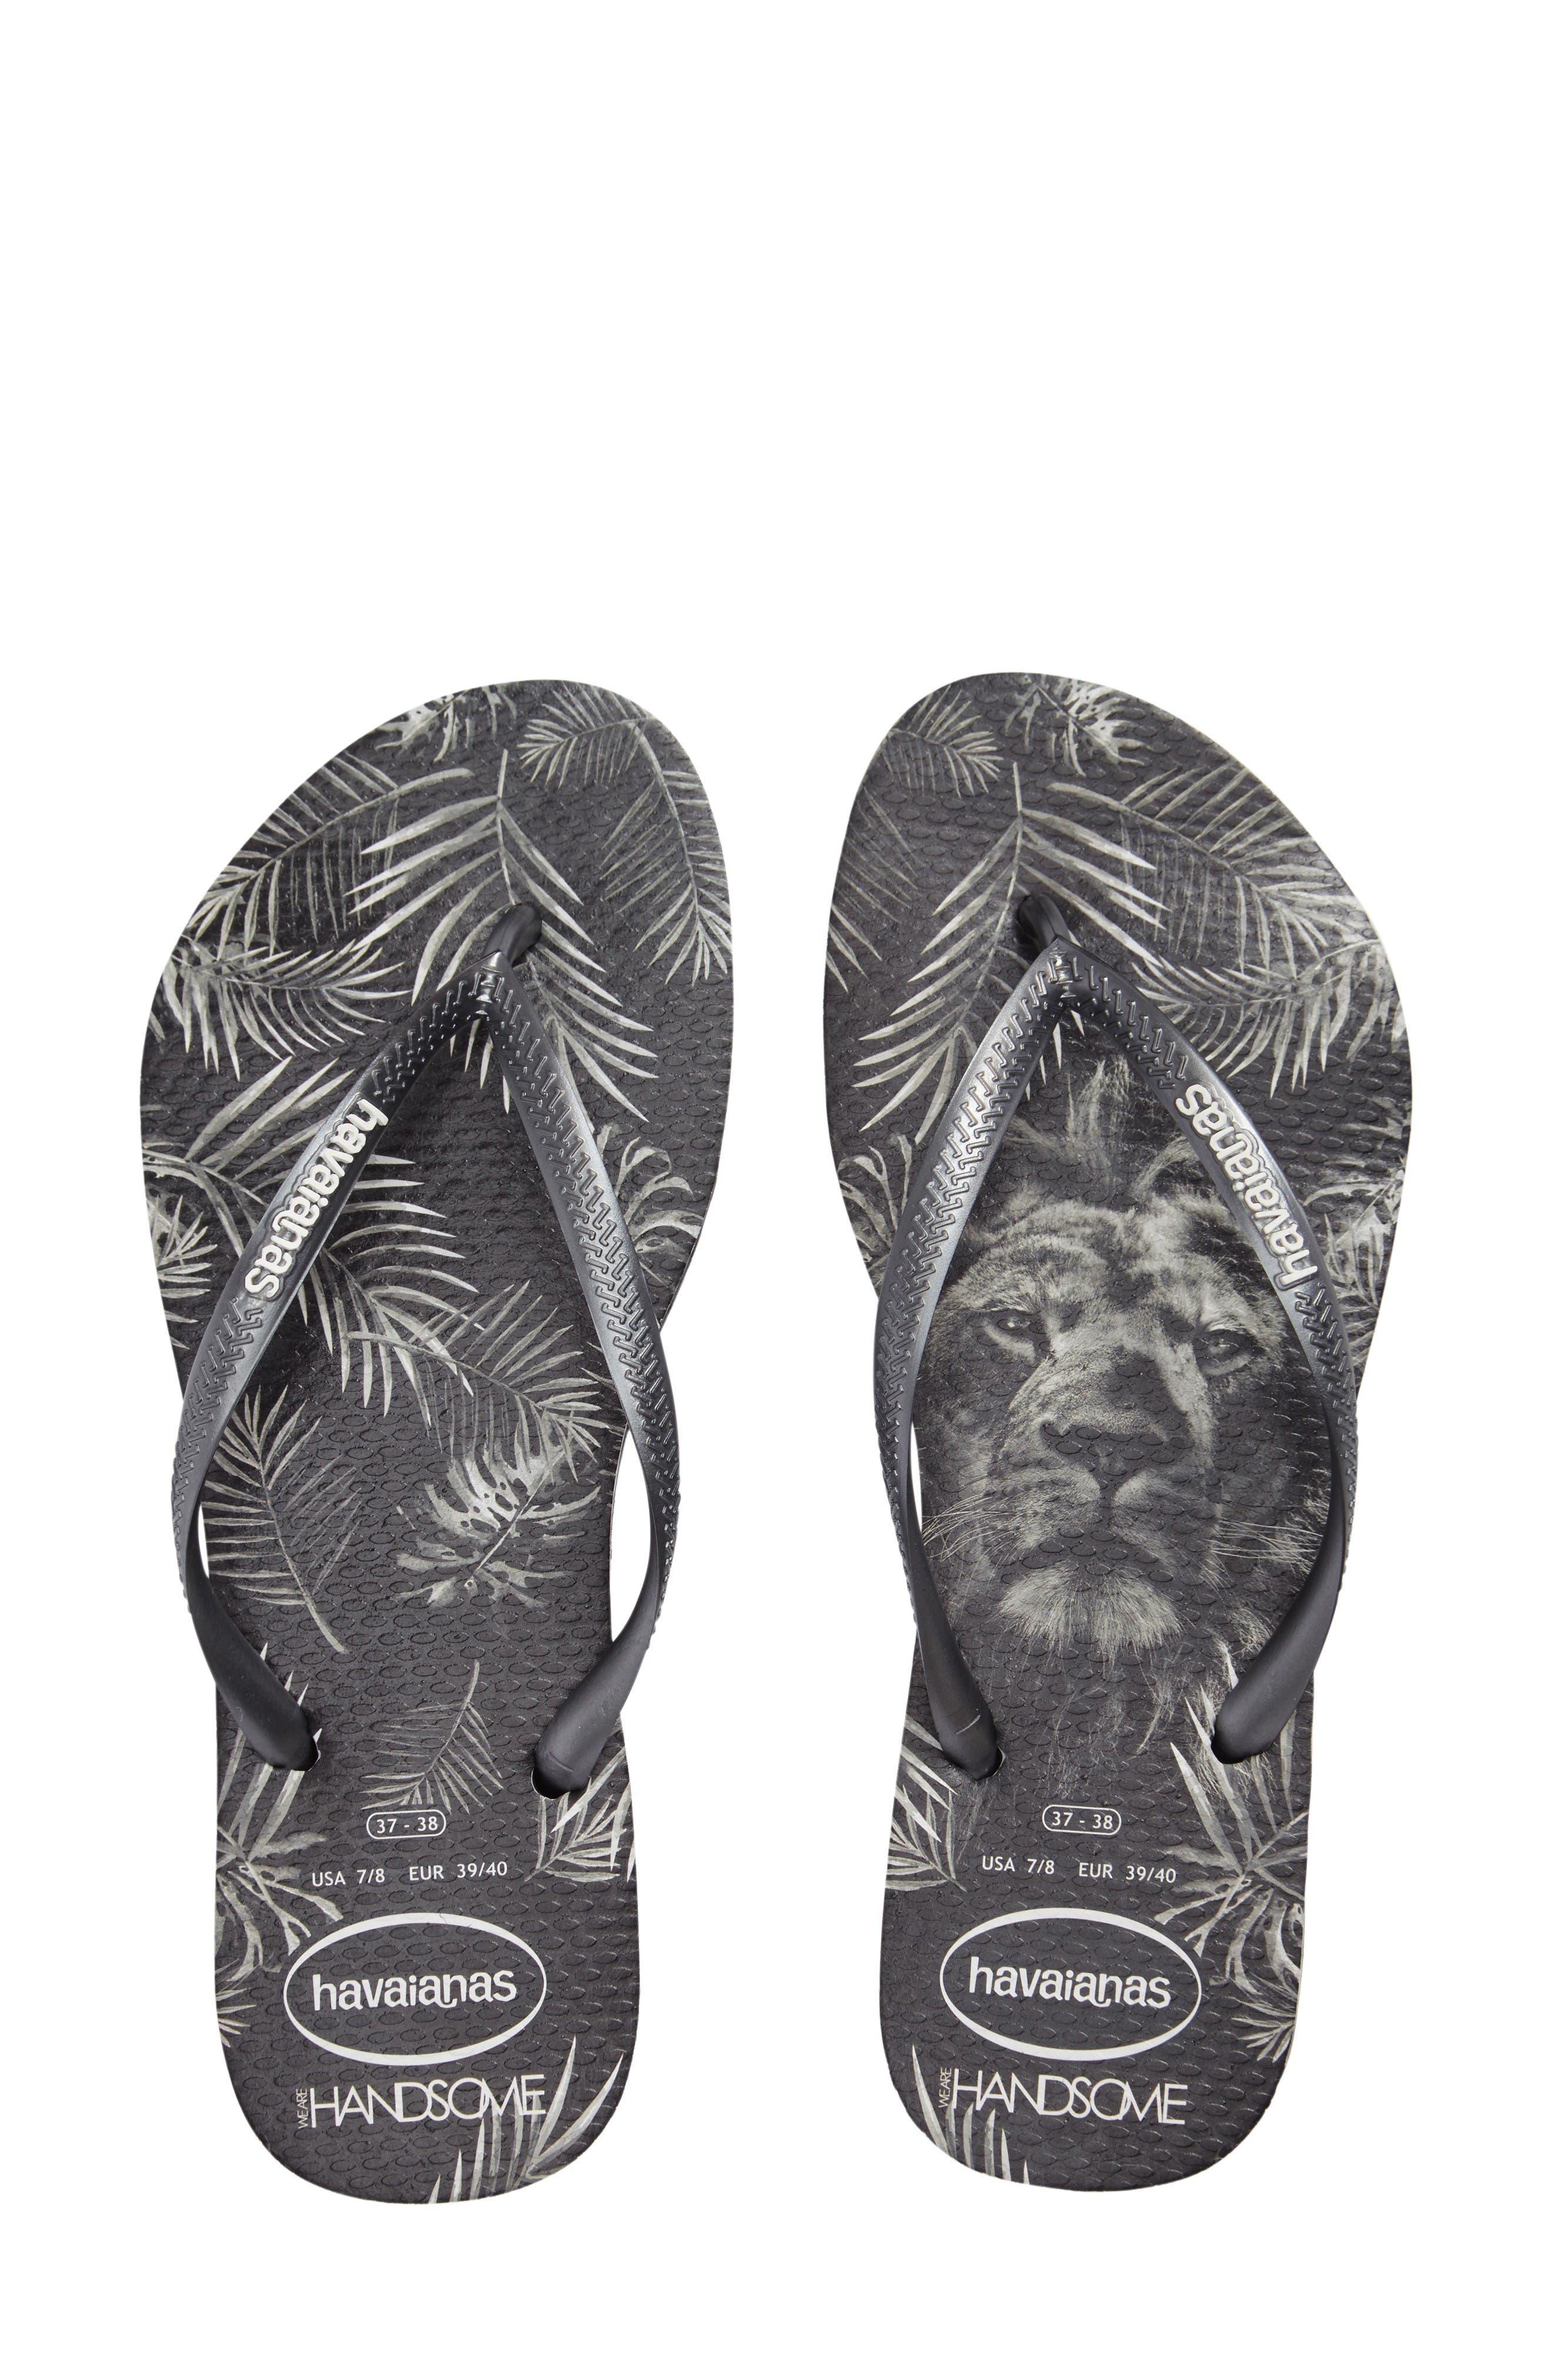 Alternate Image 1 Selected - Havaianas Slim Handsome Flip Flop (Women)